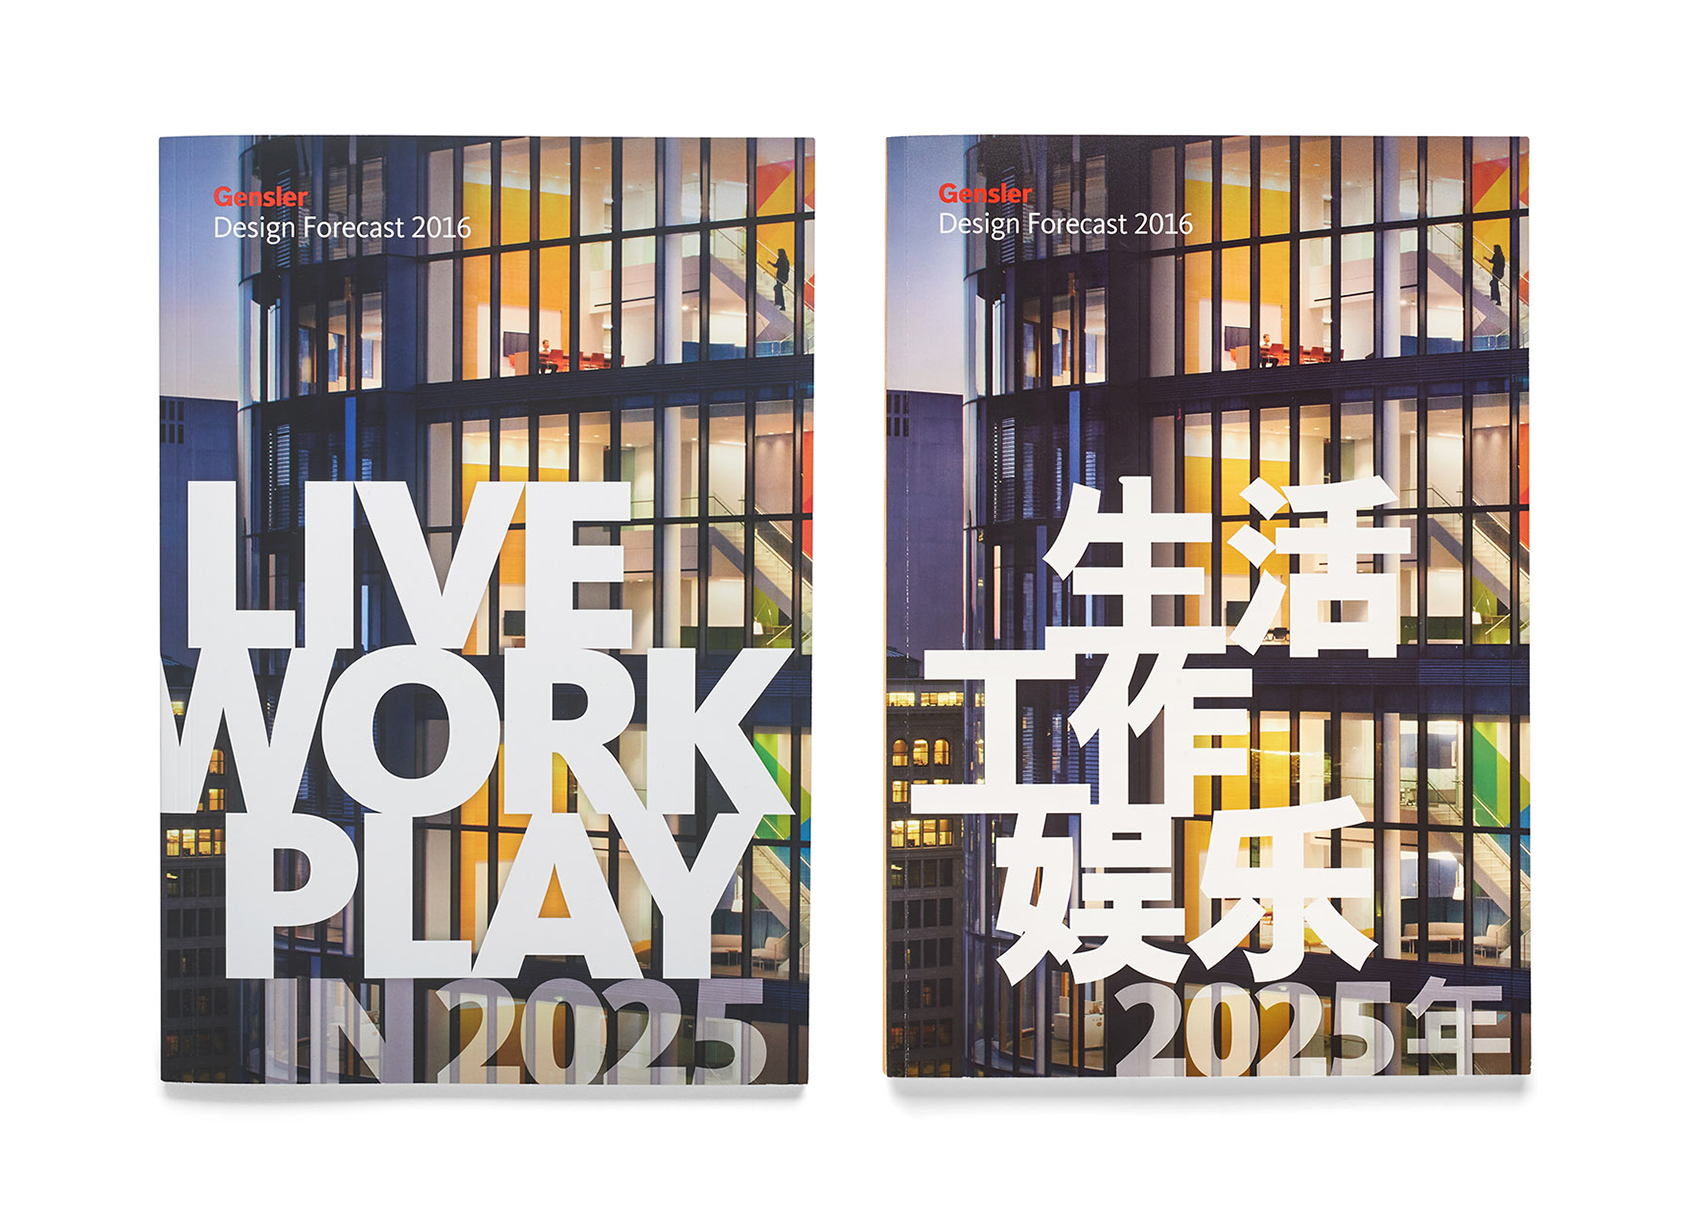 Design Forecast 2016 English cover and Mandarin cover.